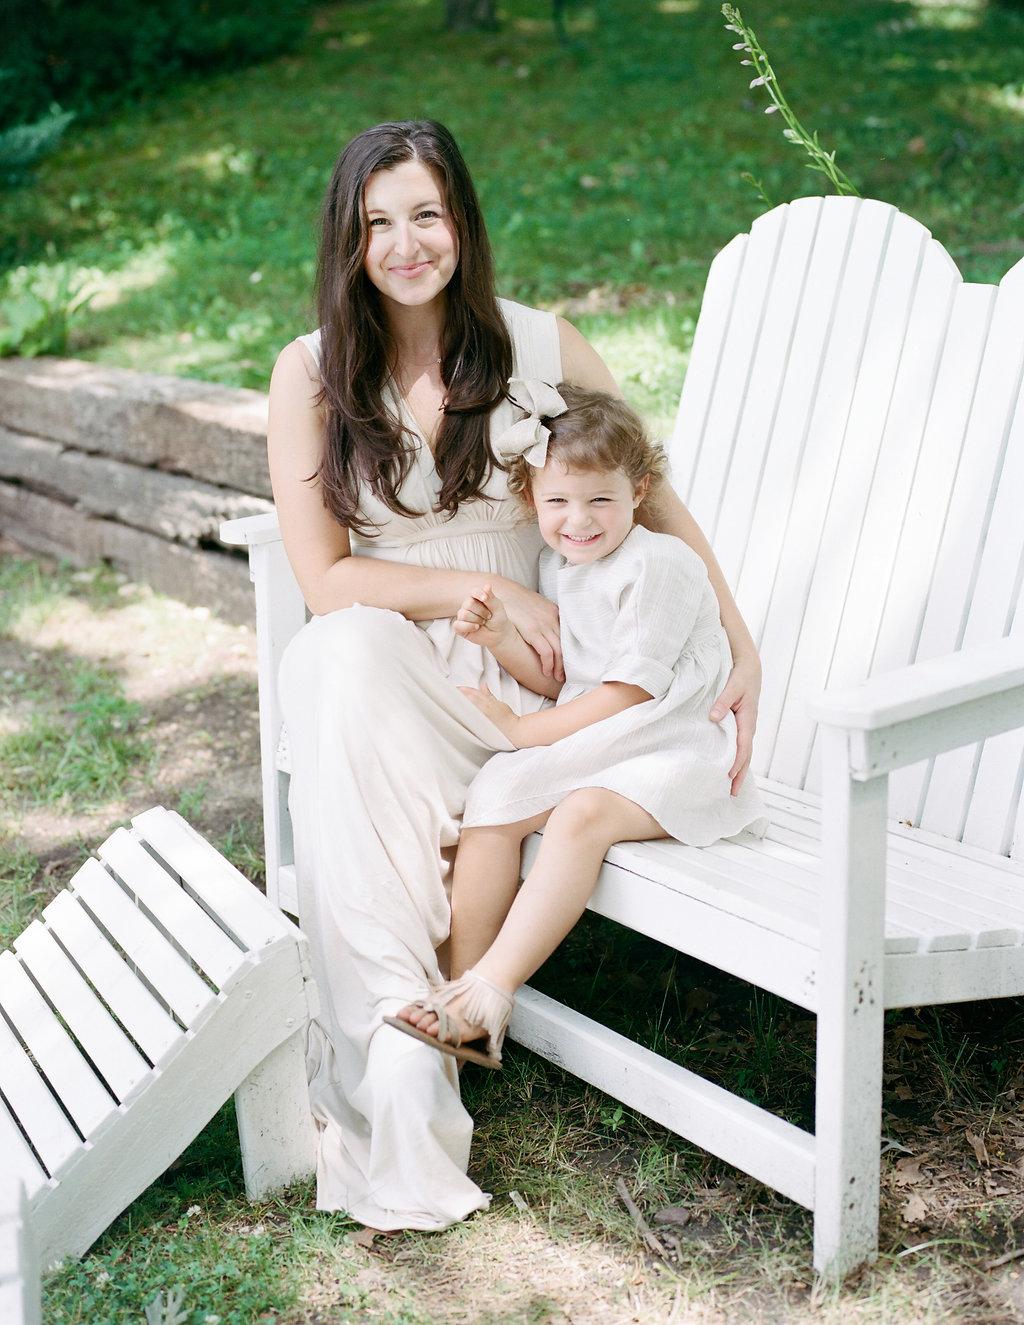 Jessica Zimmerman | Personal Blog | Cherishing the Fast Moving Moments